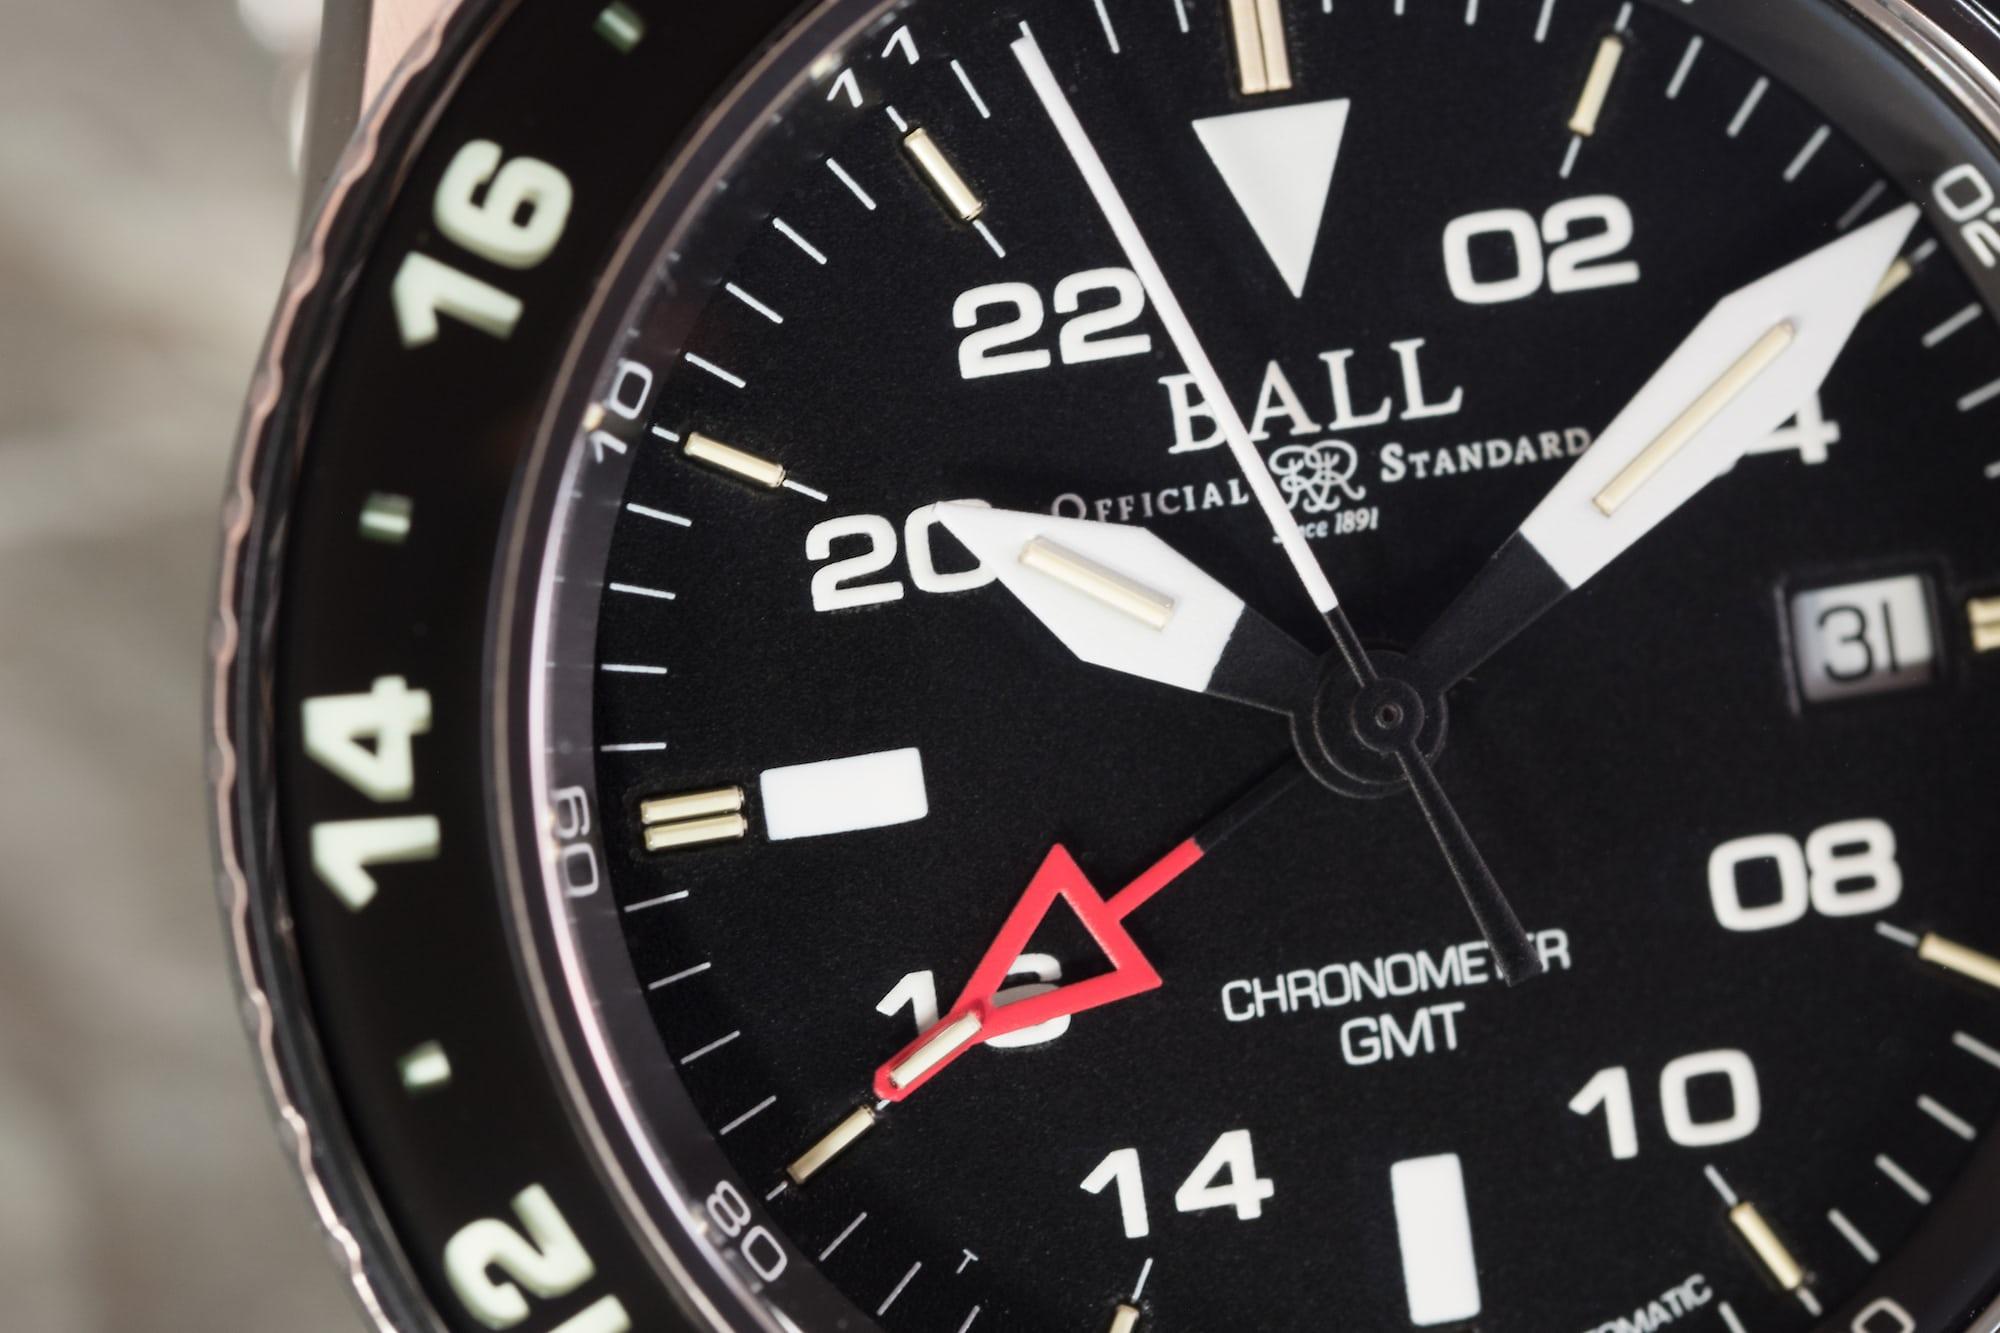 Ball Engineer Hydrocarbon AeroGMT II dial closeup